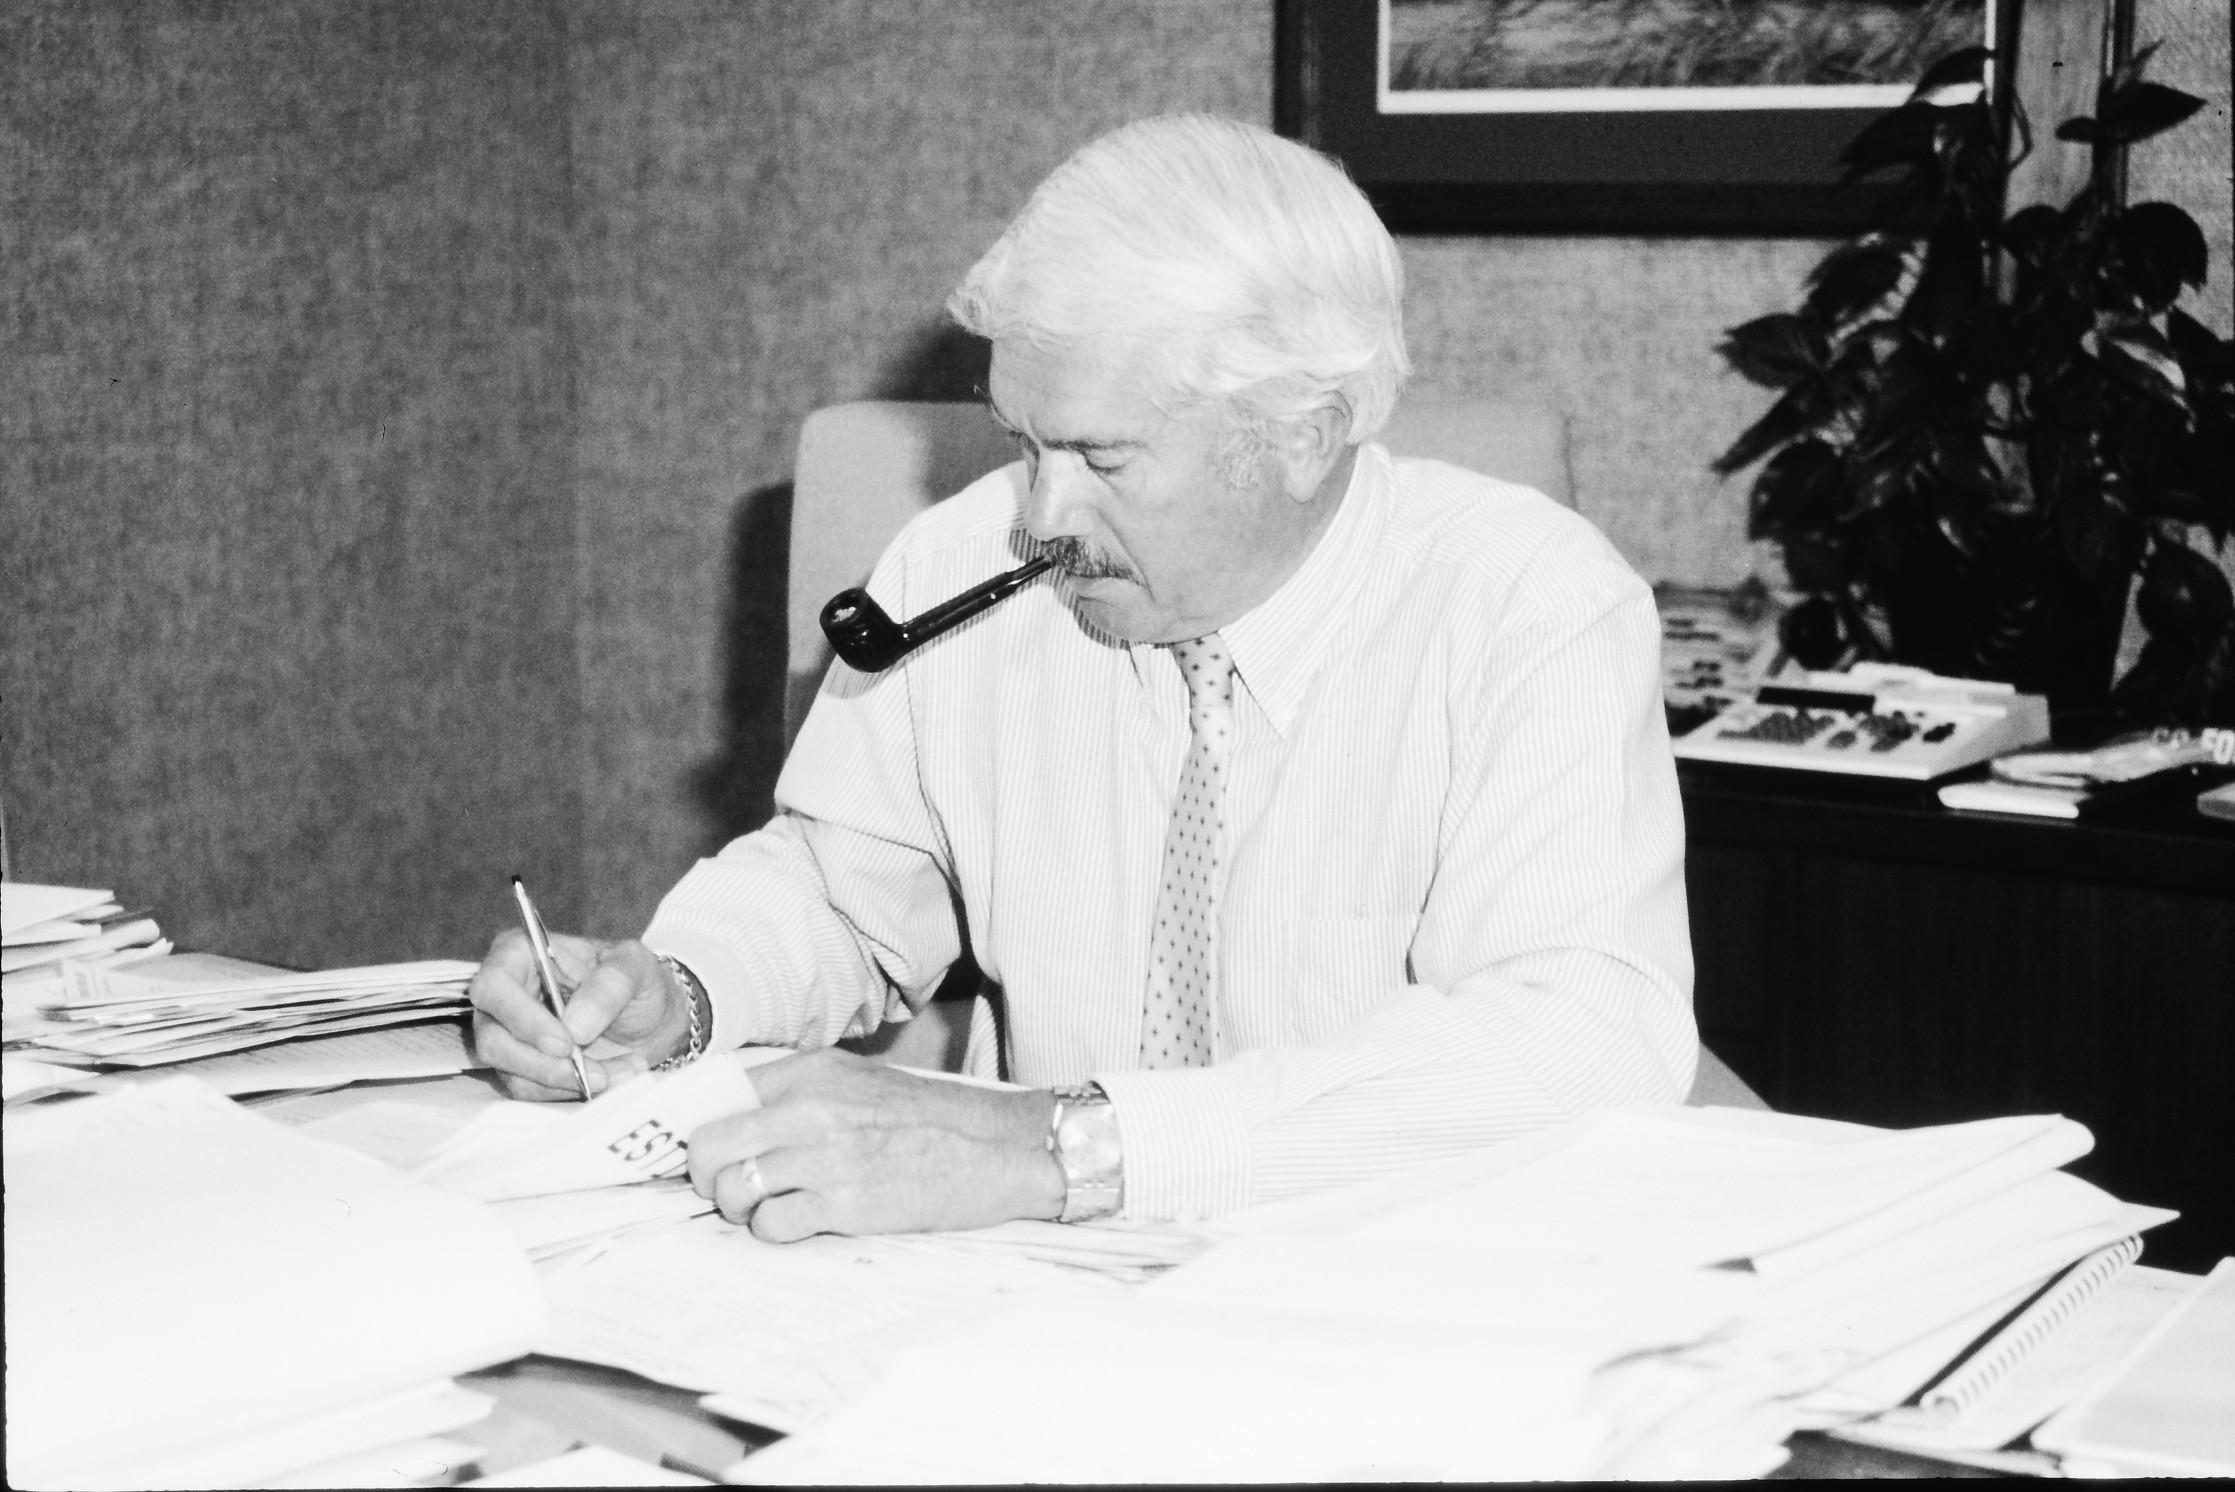 1980s-richard-l-schmidt-working-at-desk